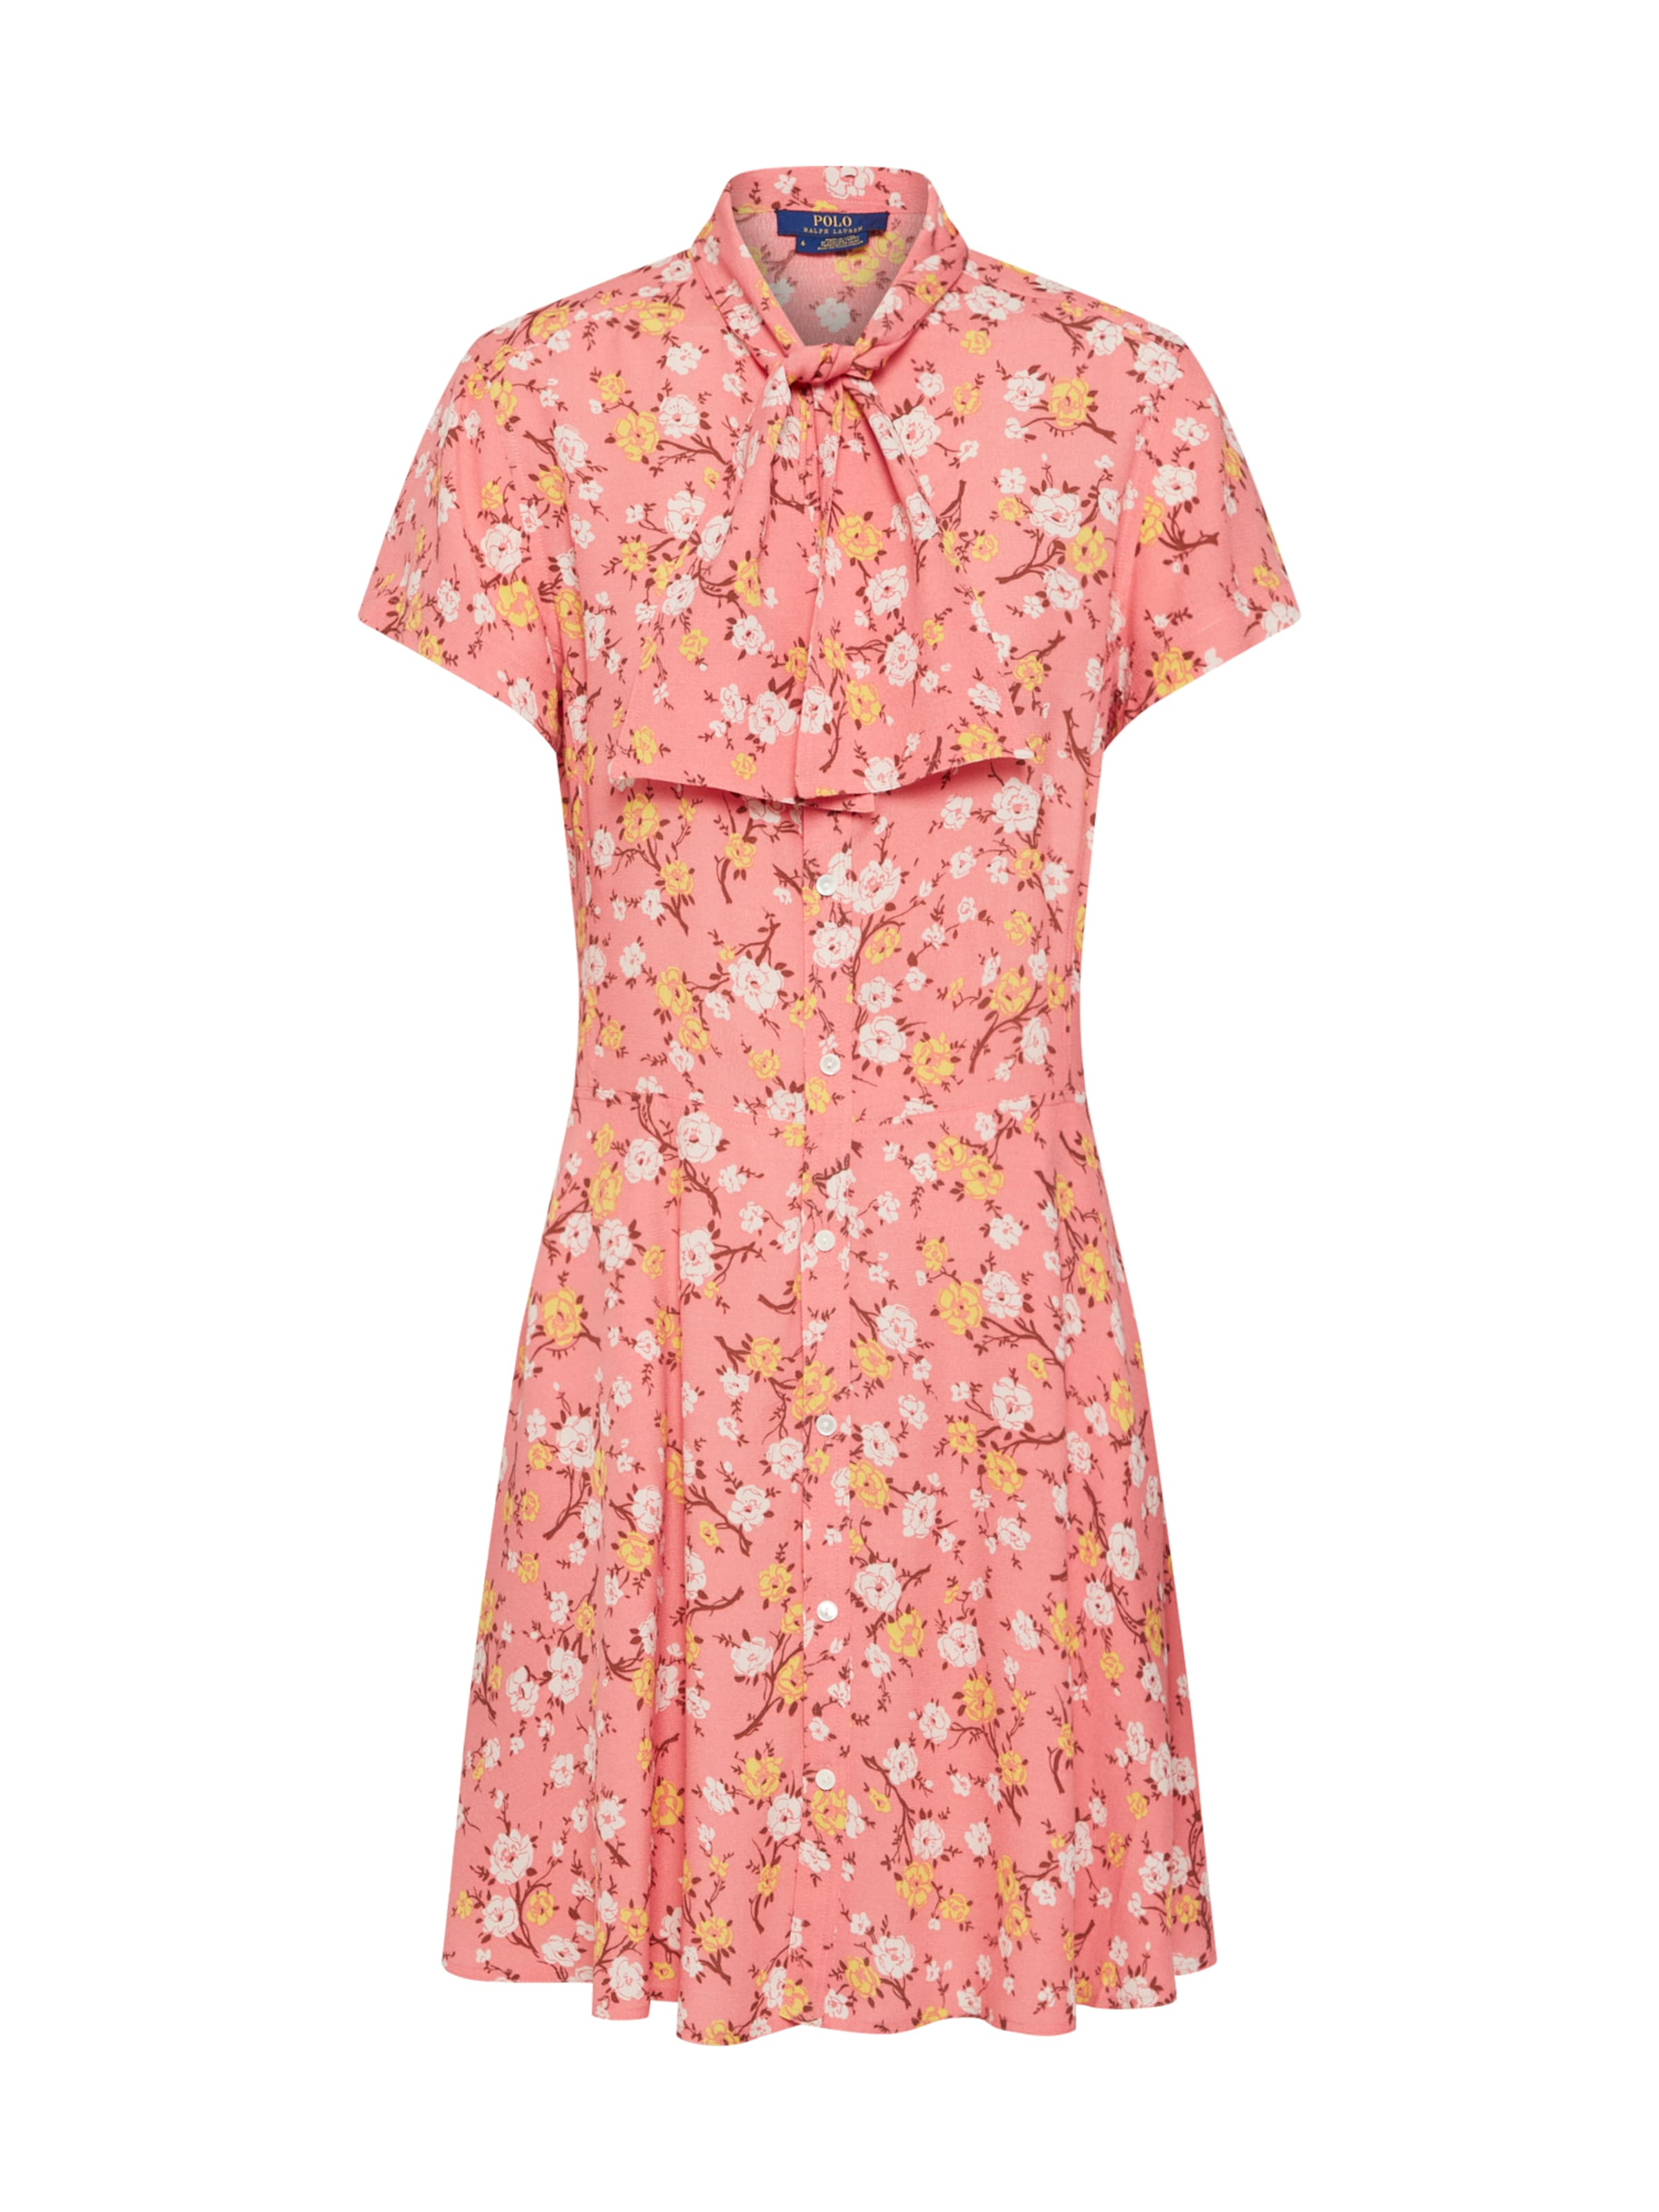 casual AbricotSaumon Be En 'ss short Dress' Sleeve Polo Lauren Dr Ralph chemise Robe rBWxeodC